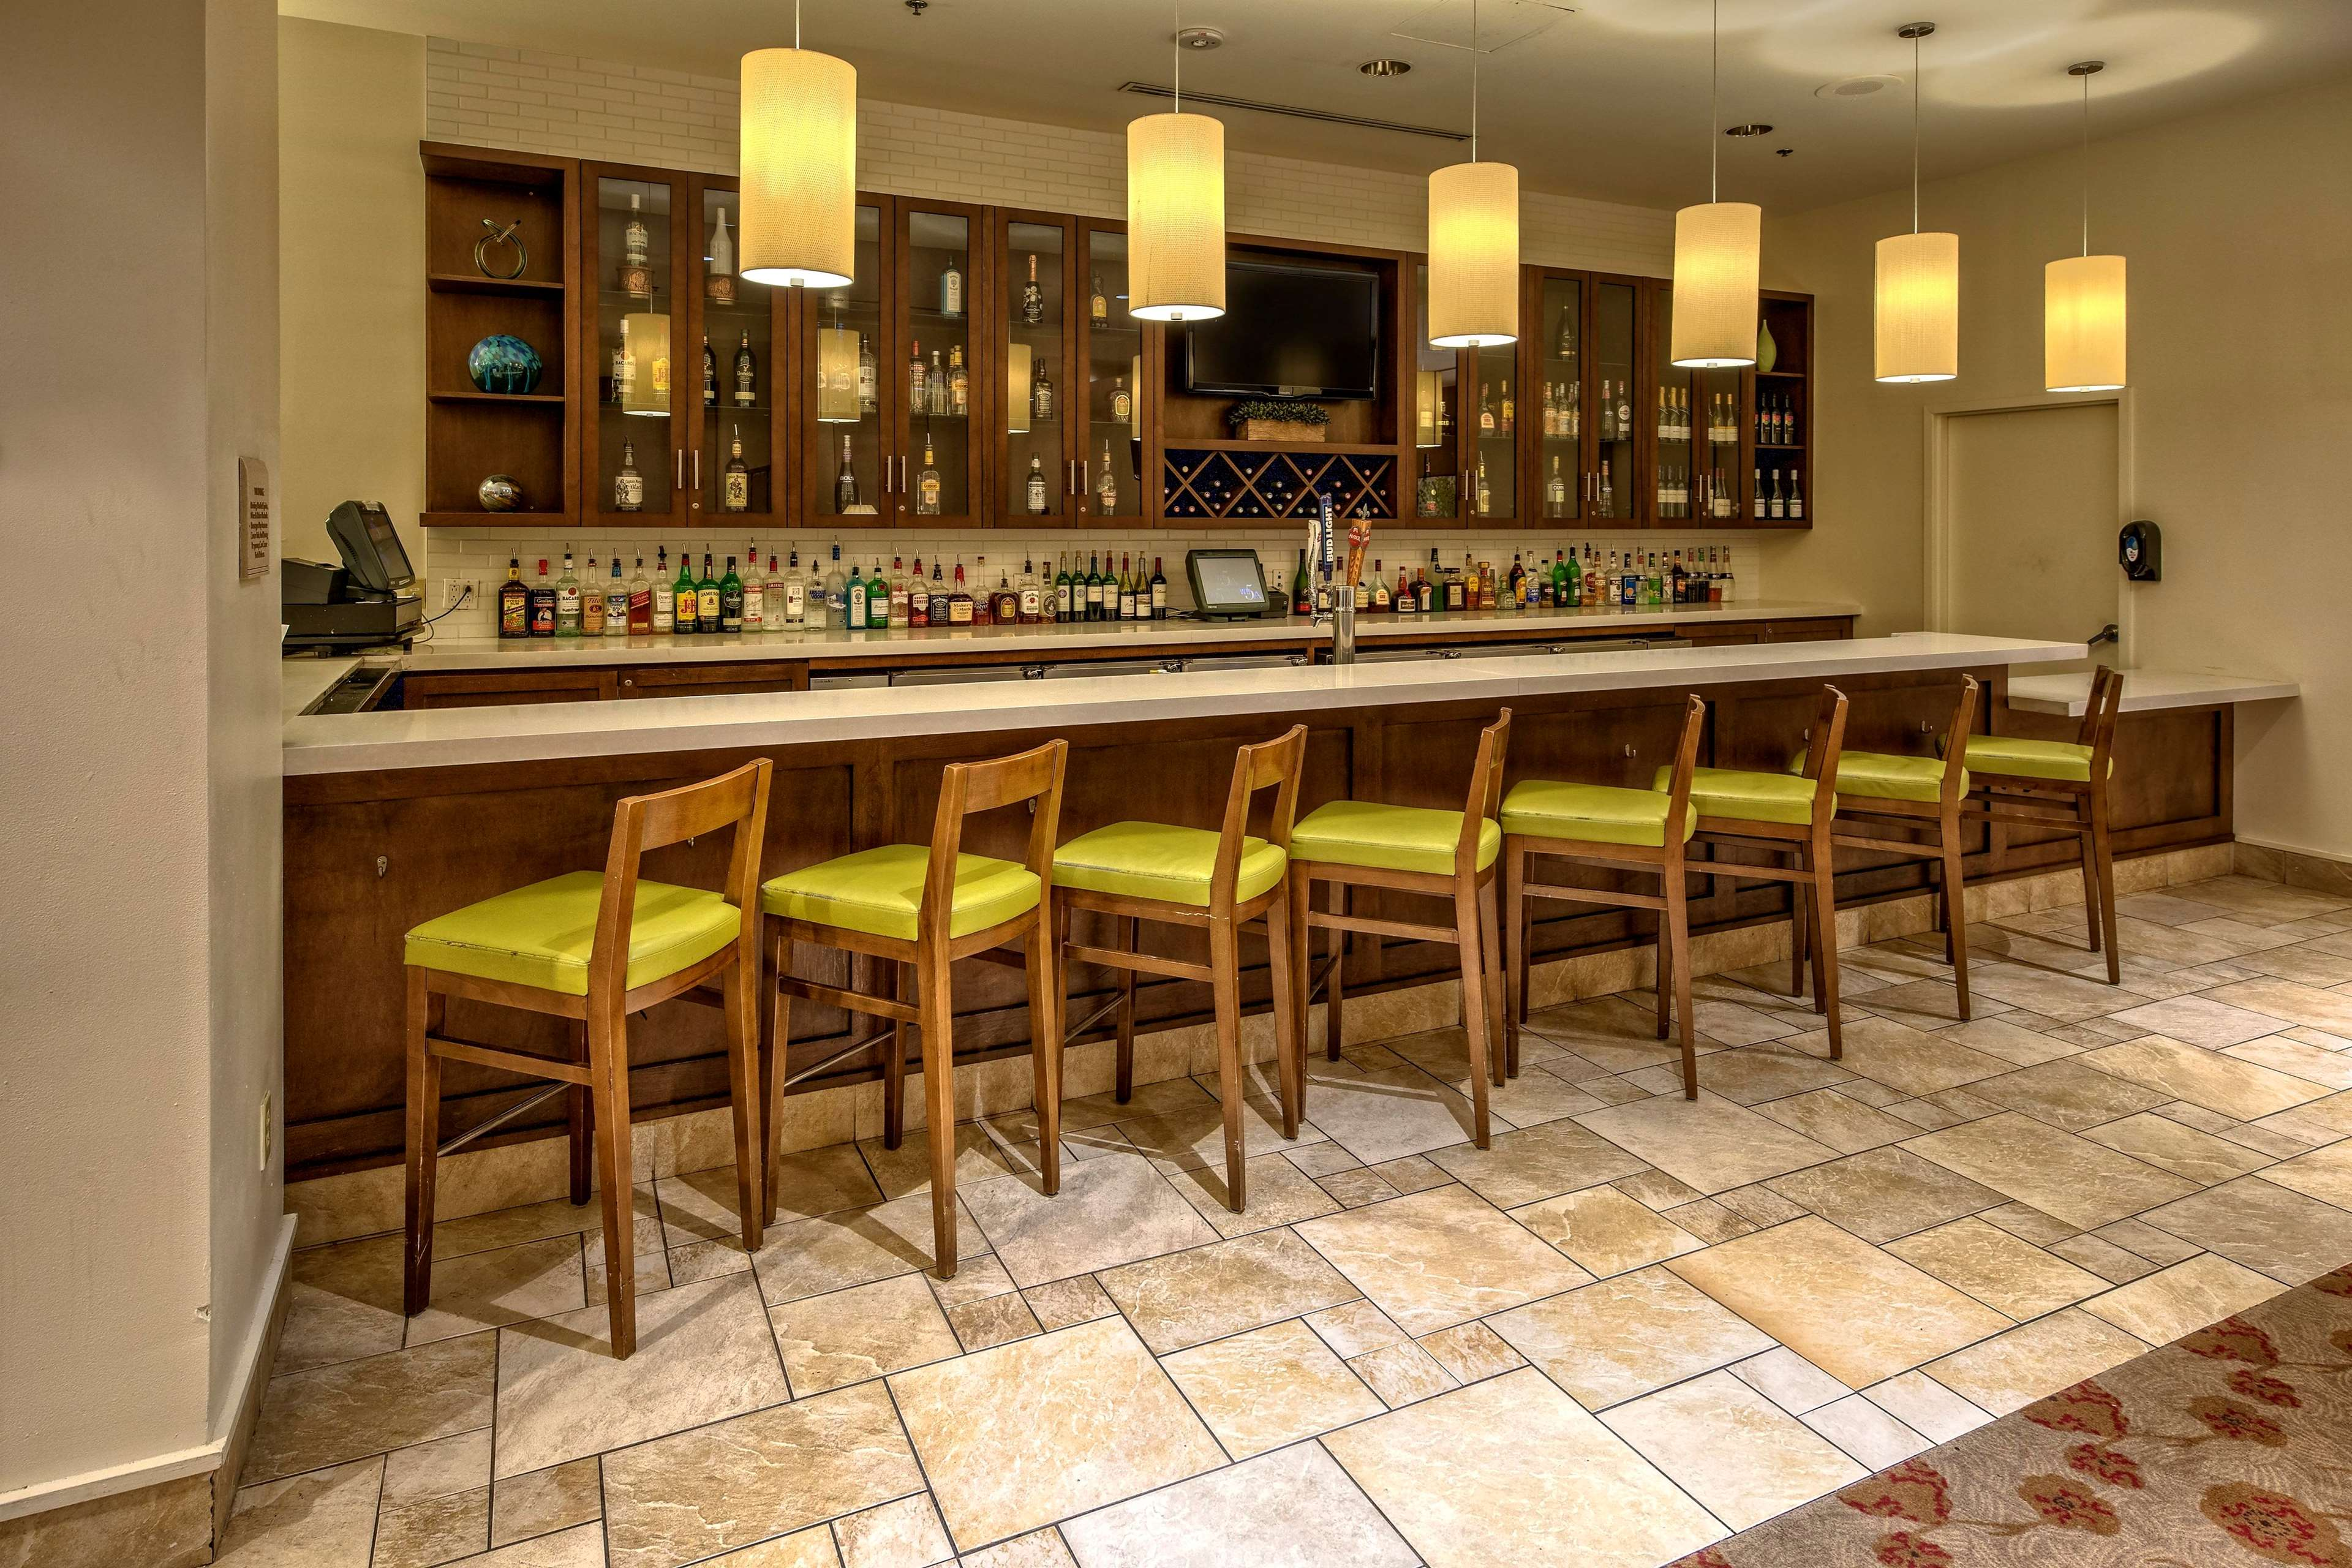 hilton garden inn new orleans convention center at 1001 s. Black Bedroom Furniture Sets. Home Design Ideas